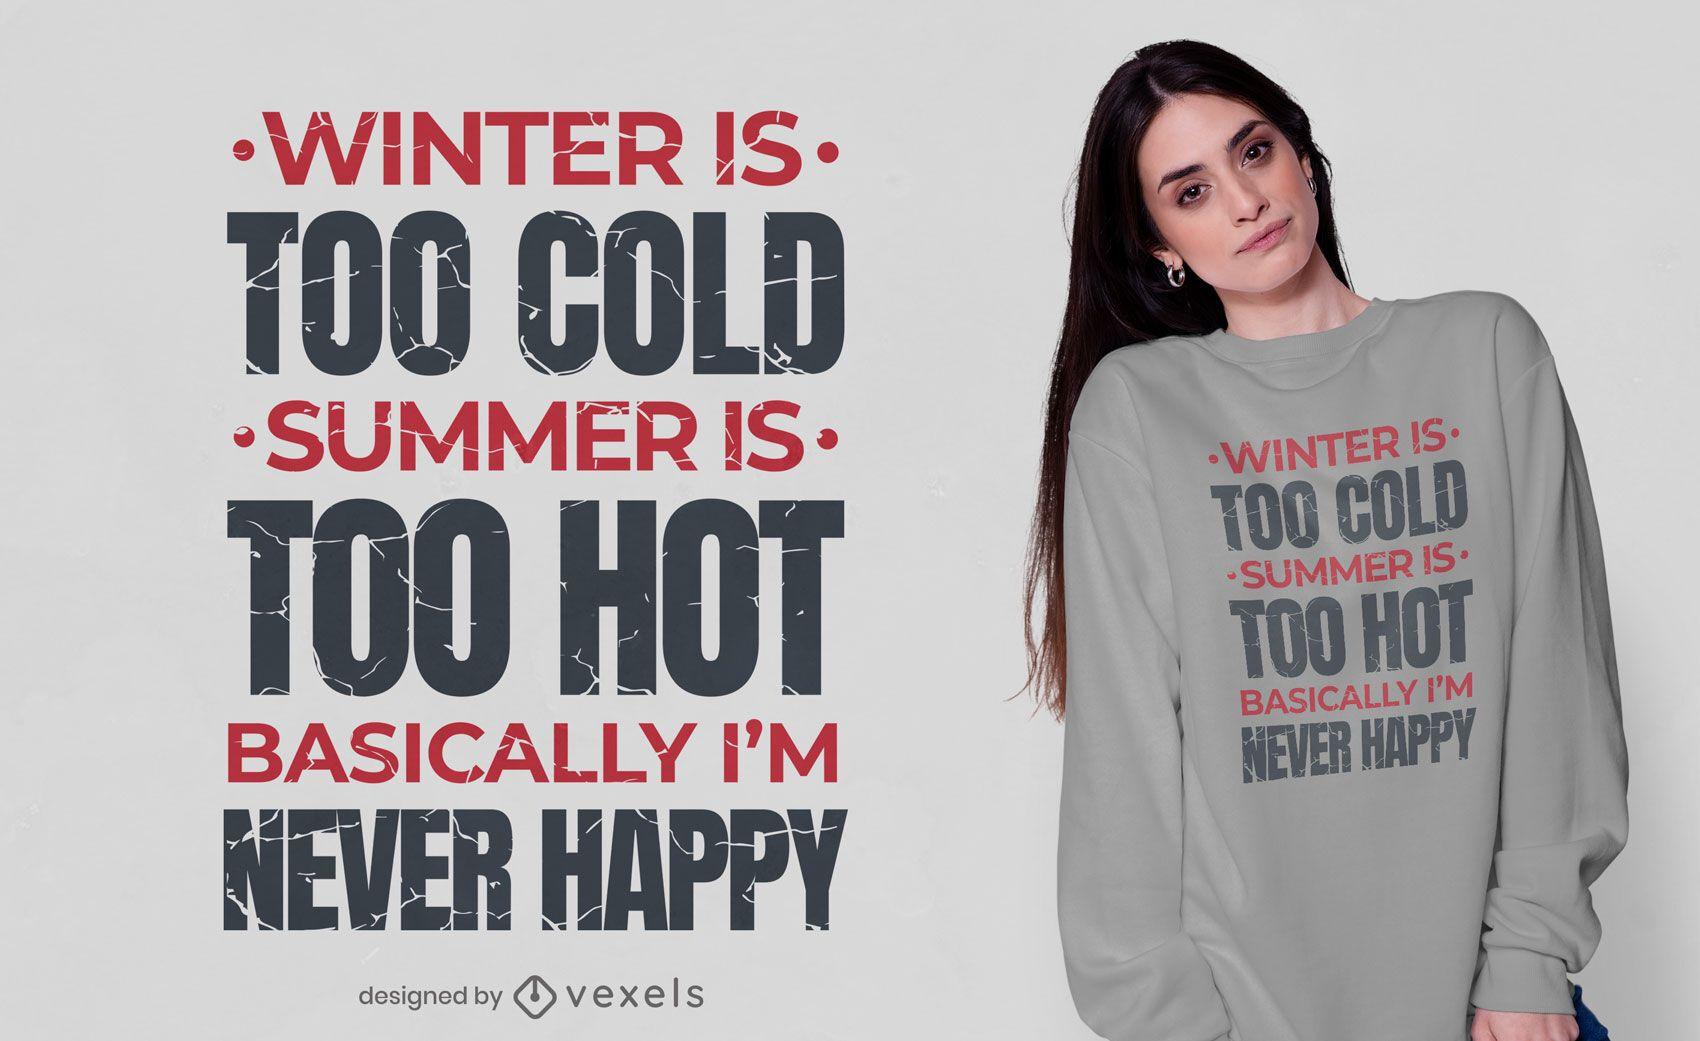 I'm never happy t-shirt design